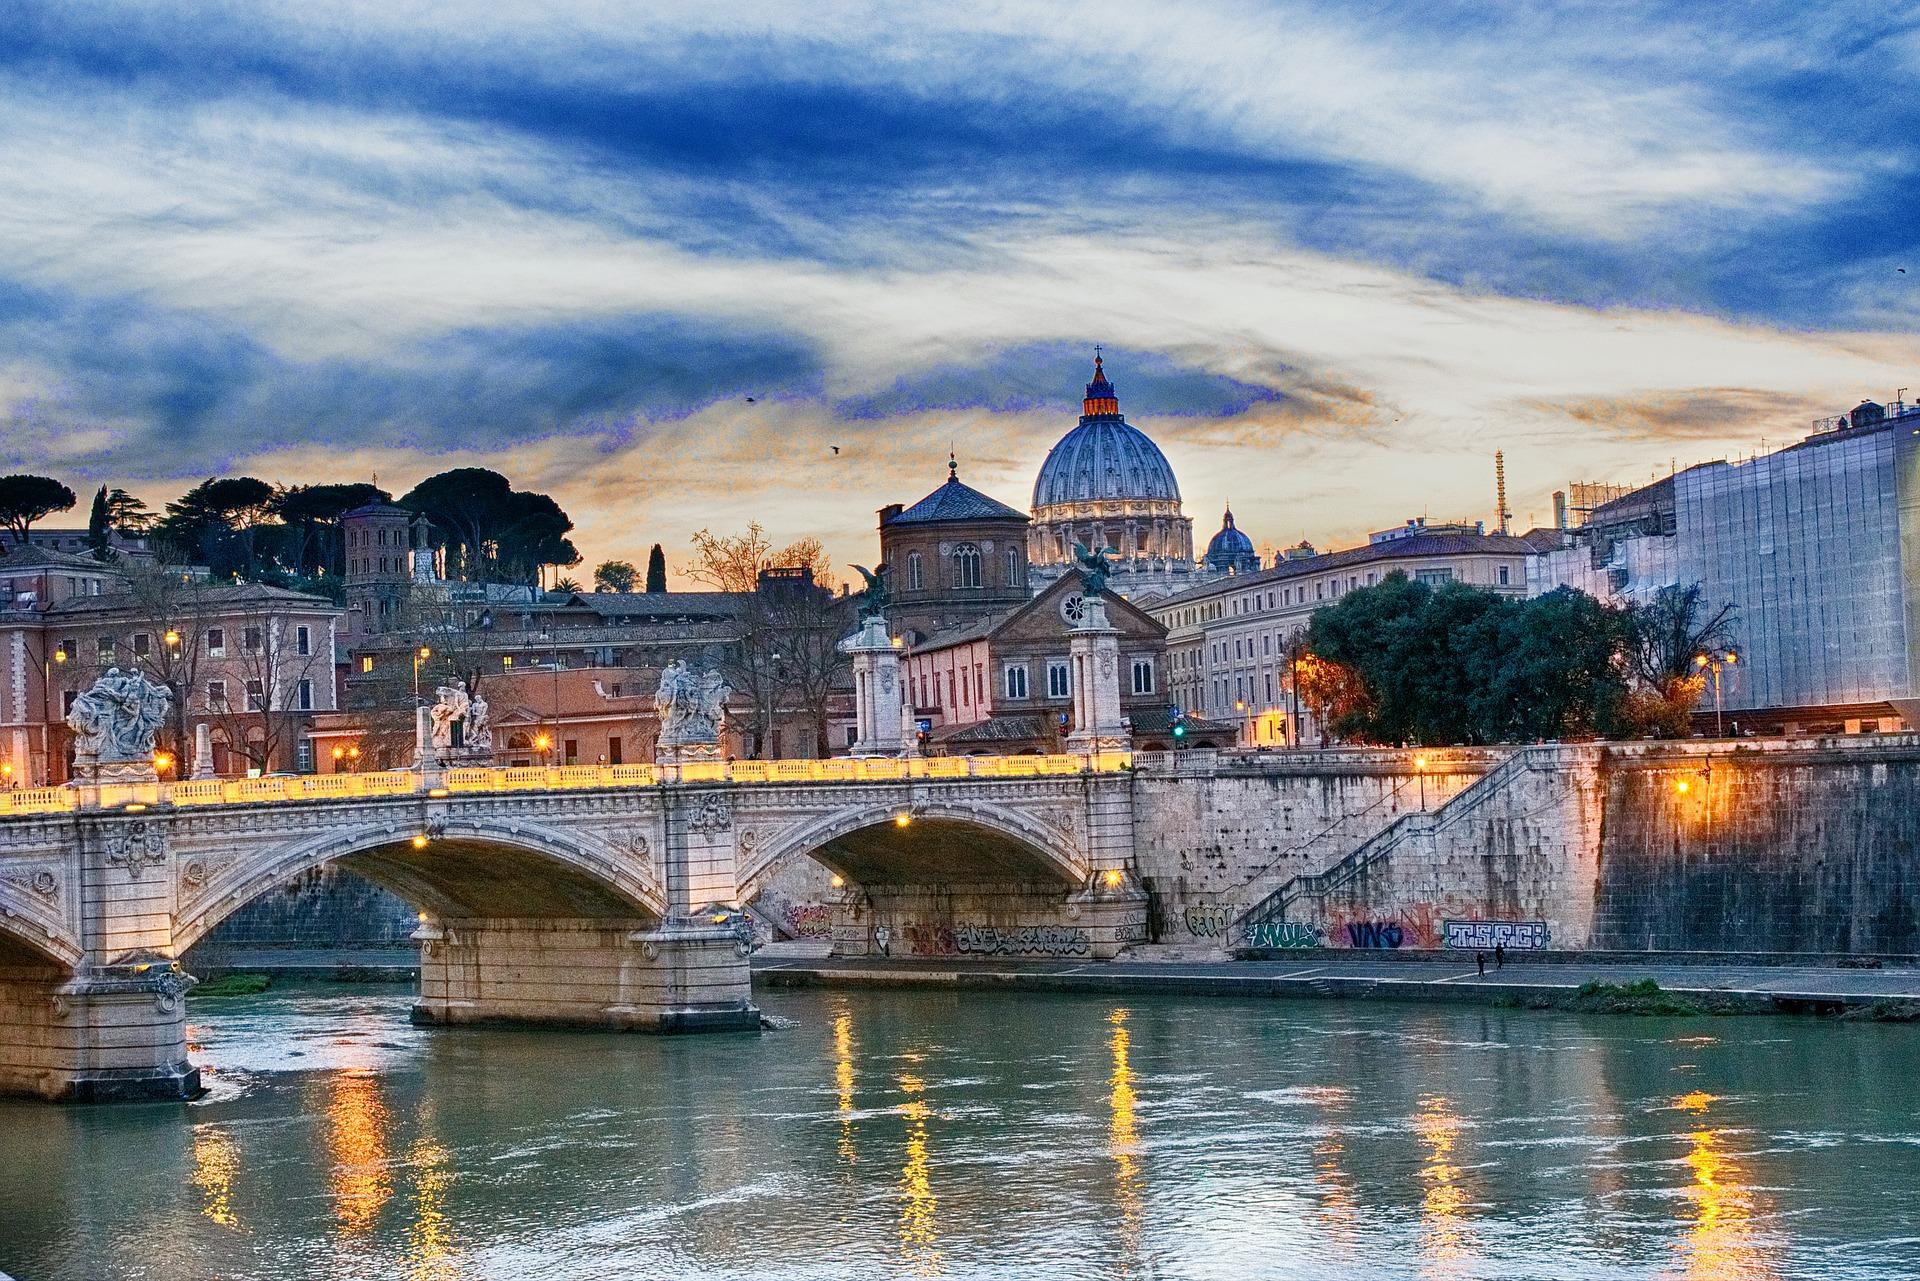 Güsntige Reise nach Rom im 4 Sterne Flaminio Village inklusive Flug ab 95,25€